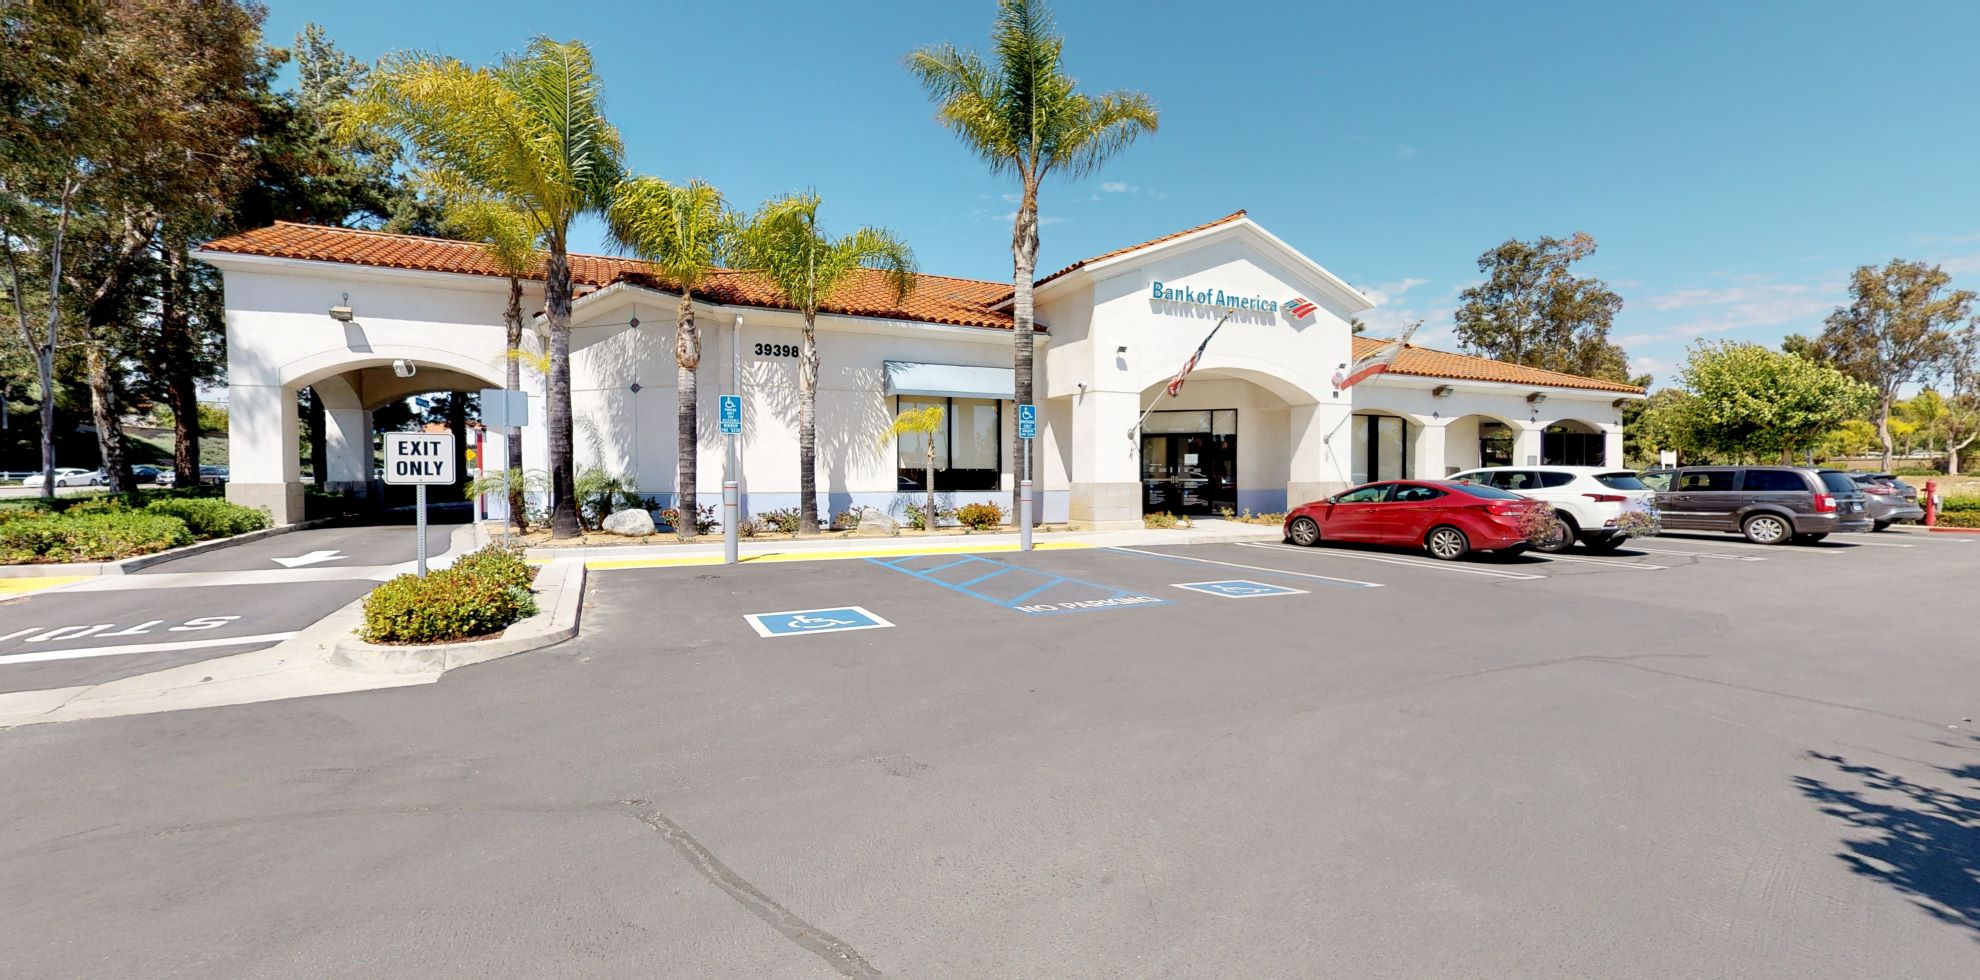 Bank of America financial center with drive-thru ATM   39398 Los Alamos Rd, Murrieta, CA 92563